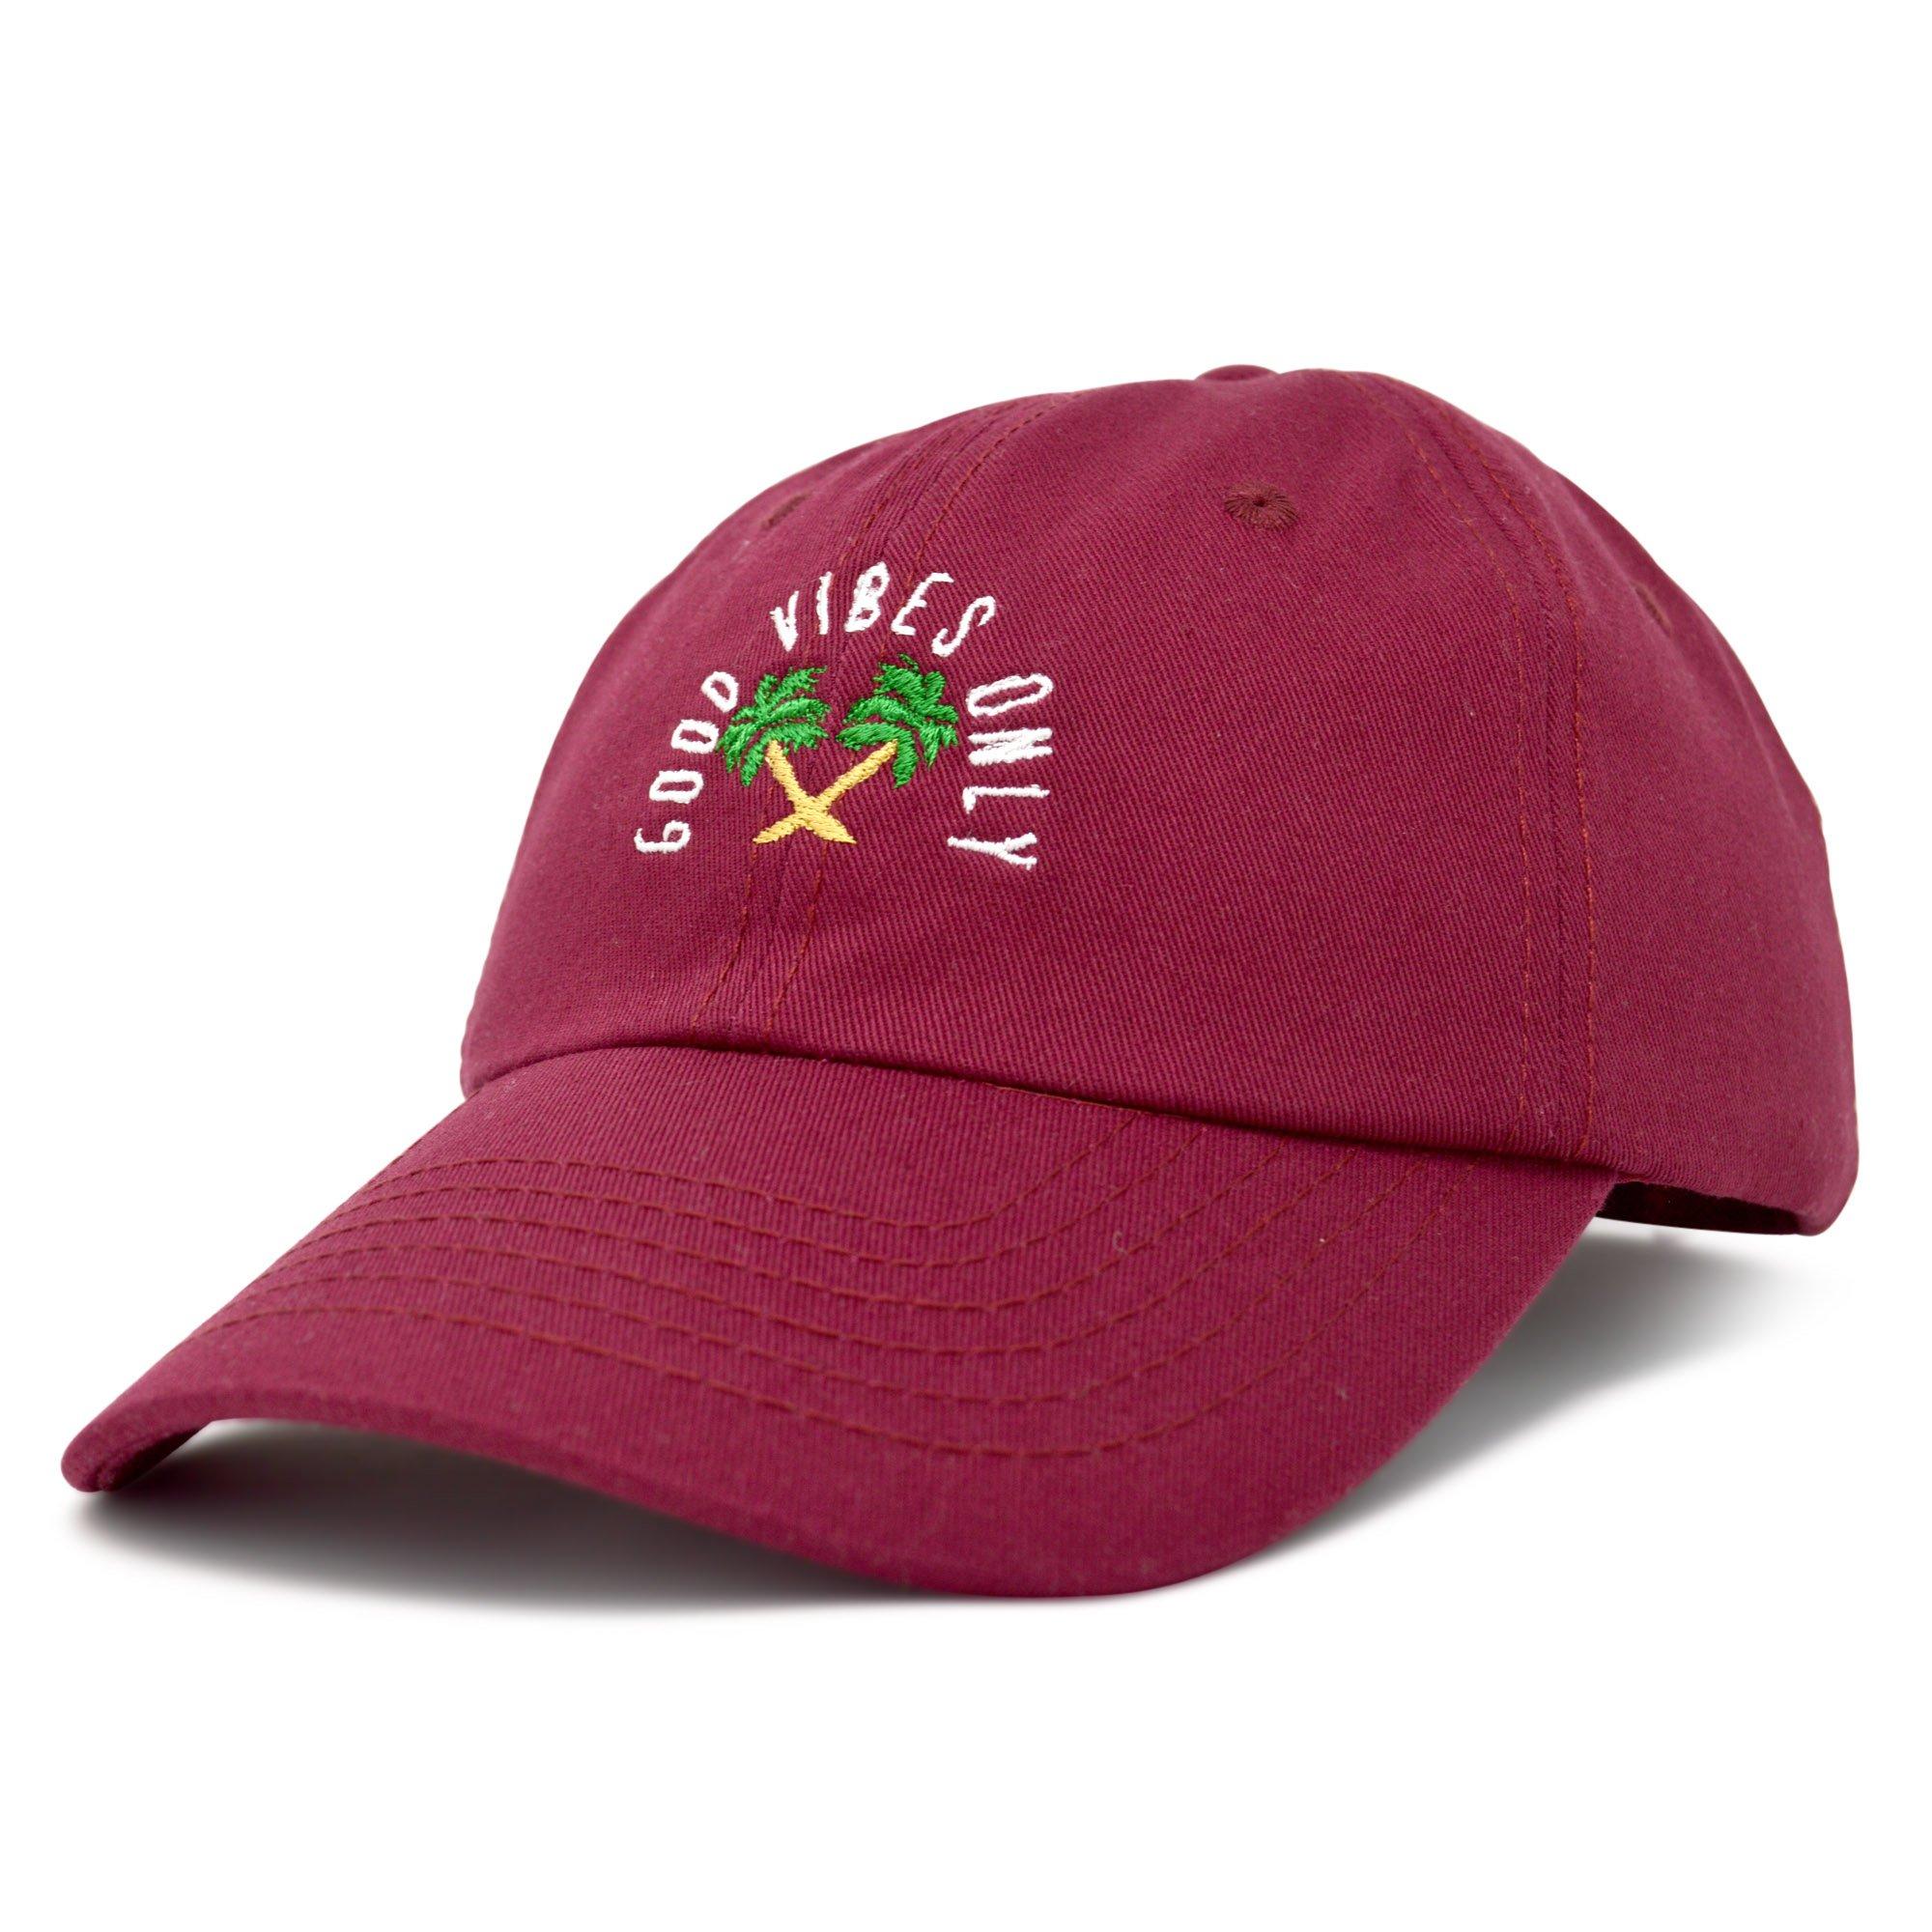 80953c9003ee1 Good Vibes Baseball Cap Dad Hat Womens Mens Hats   Products   Hats ...